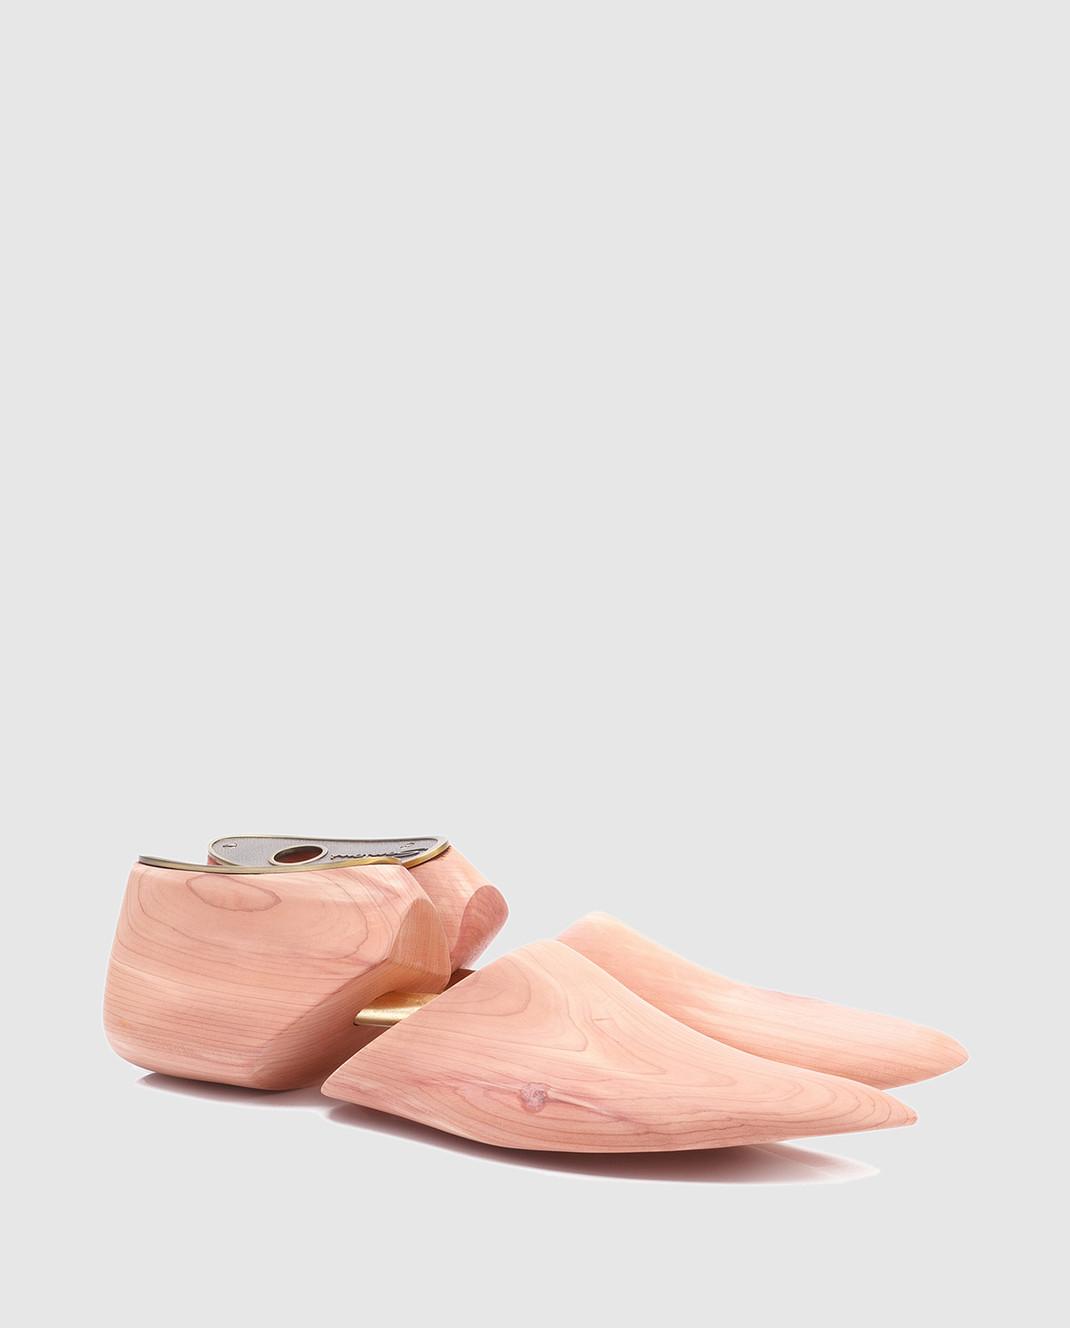 Santoni Бежевая колодка для обуви  из кедра UFAAA1069 изображение 2